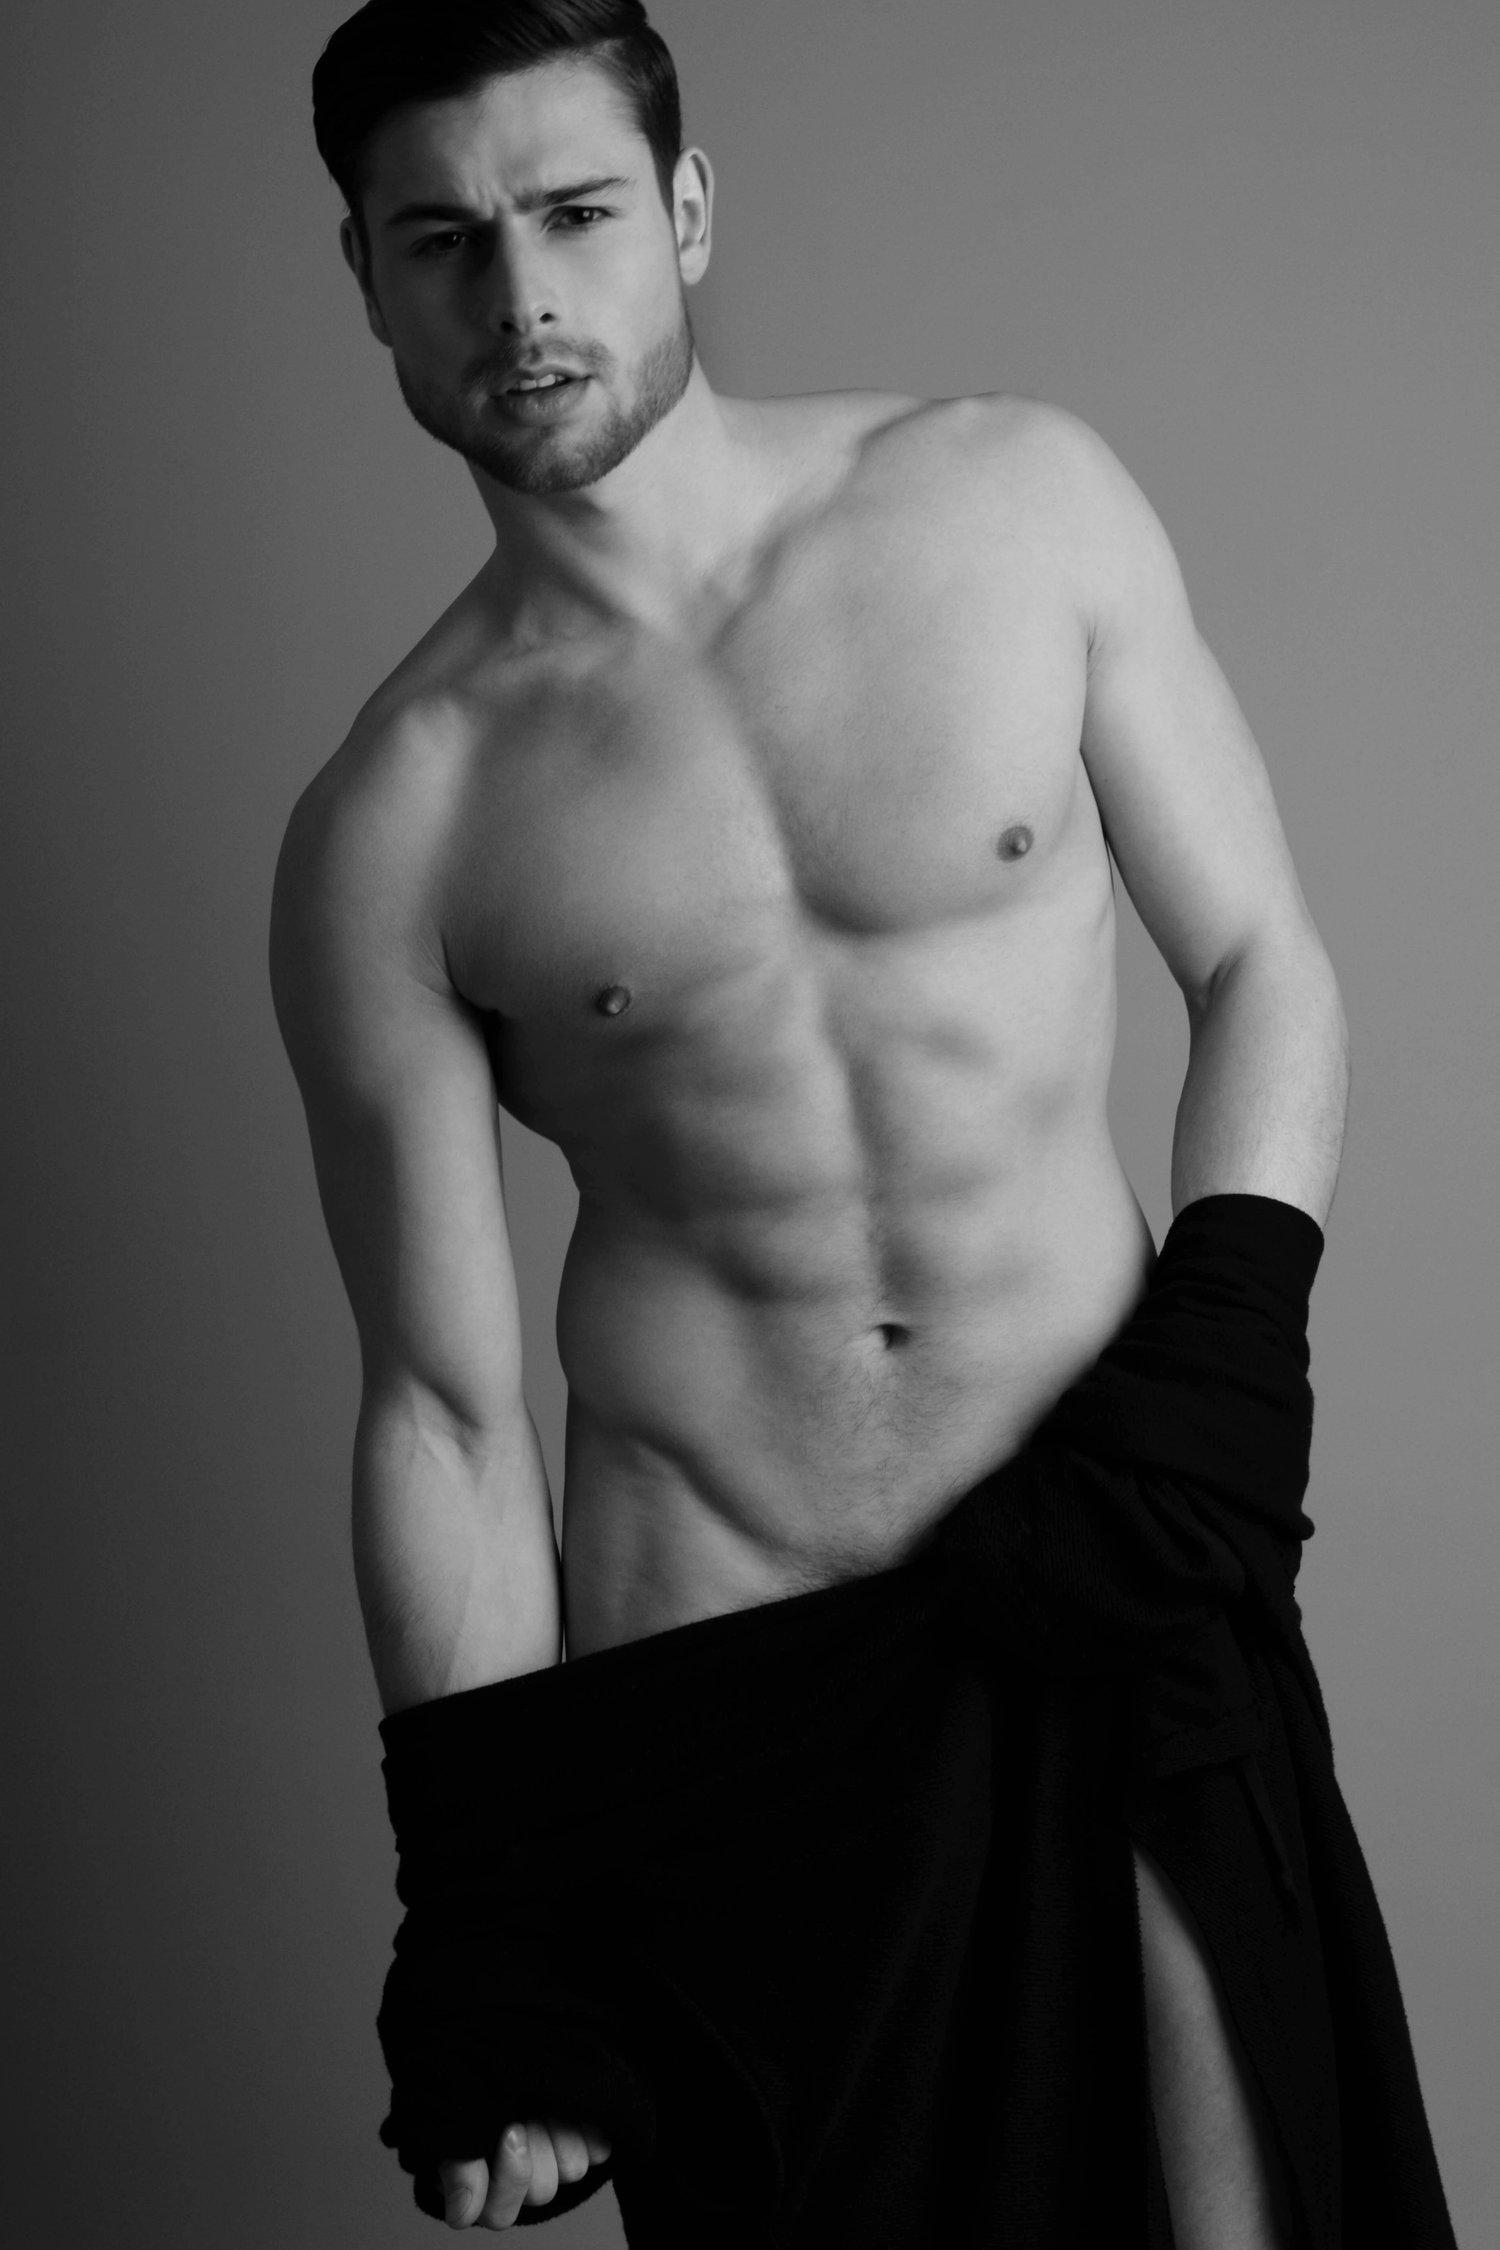 Adon Exclusive: Model Tom Walker By Malc Stone